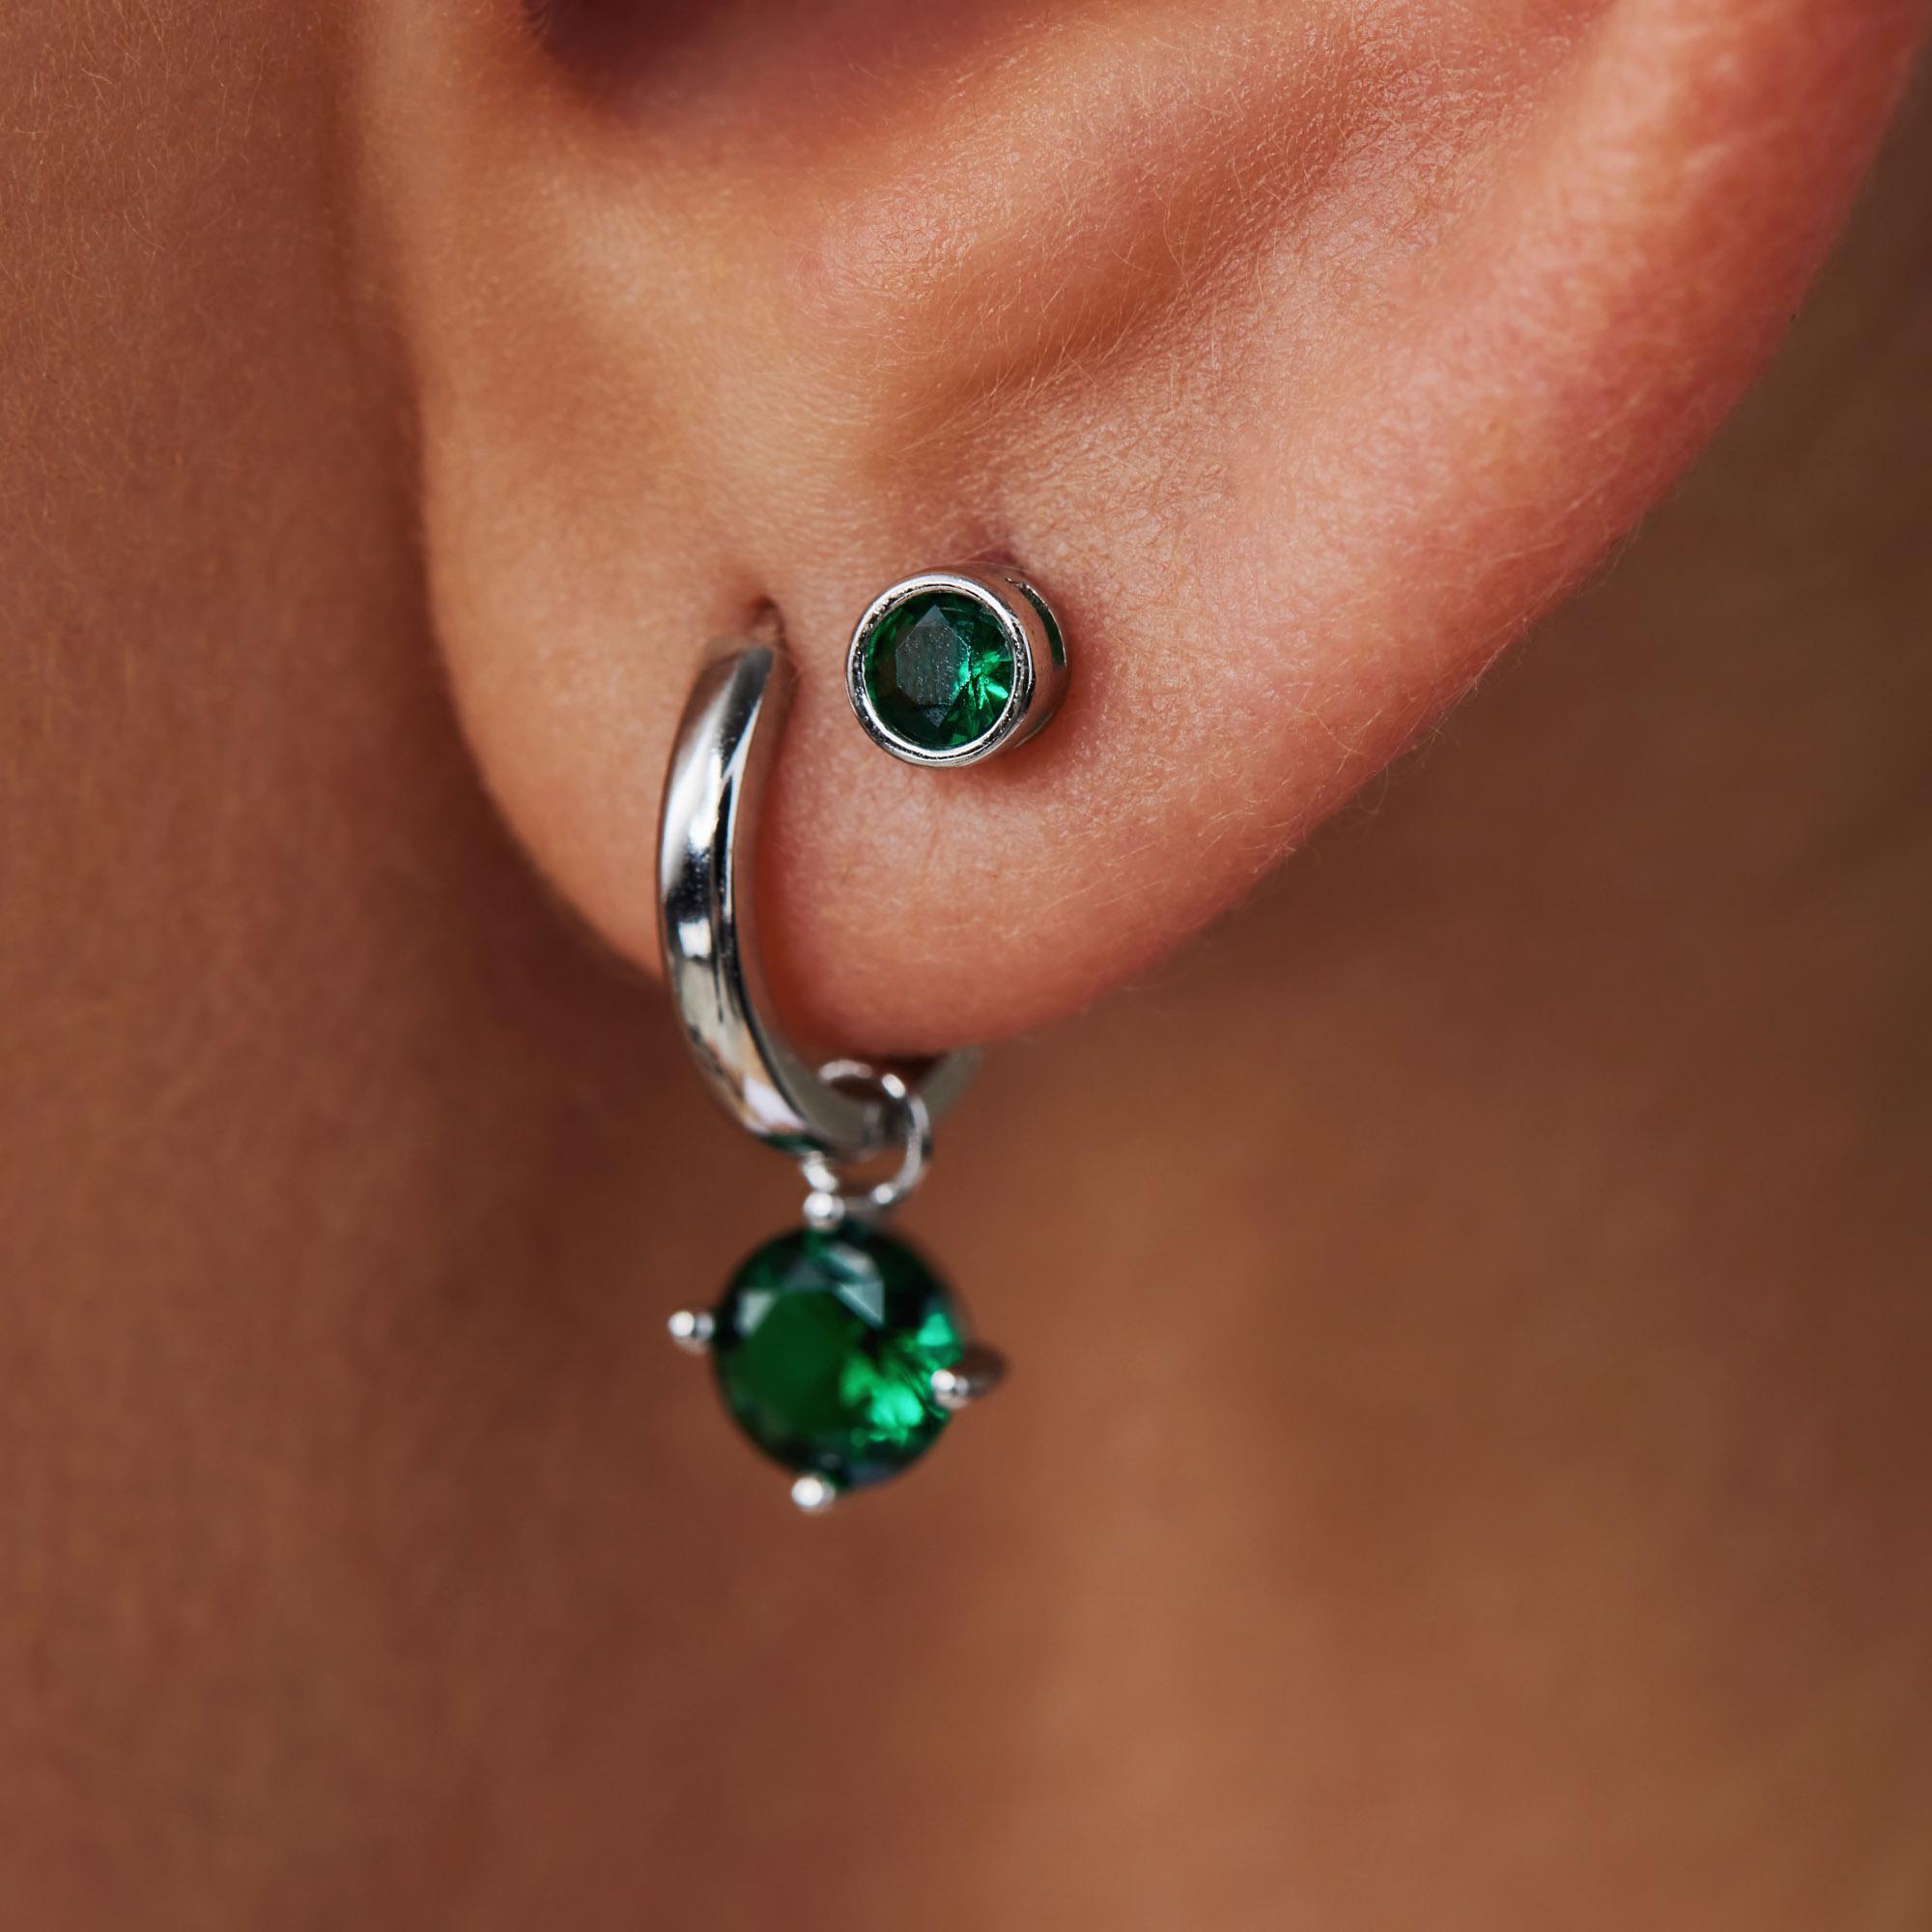 Violet Hamden Venus 925 sterling silver ear studs with birthstone